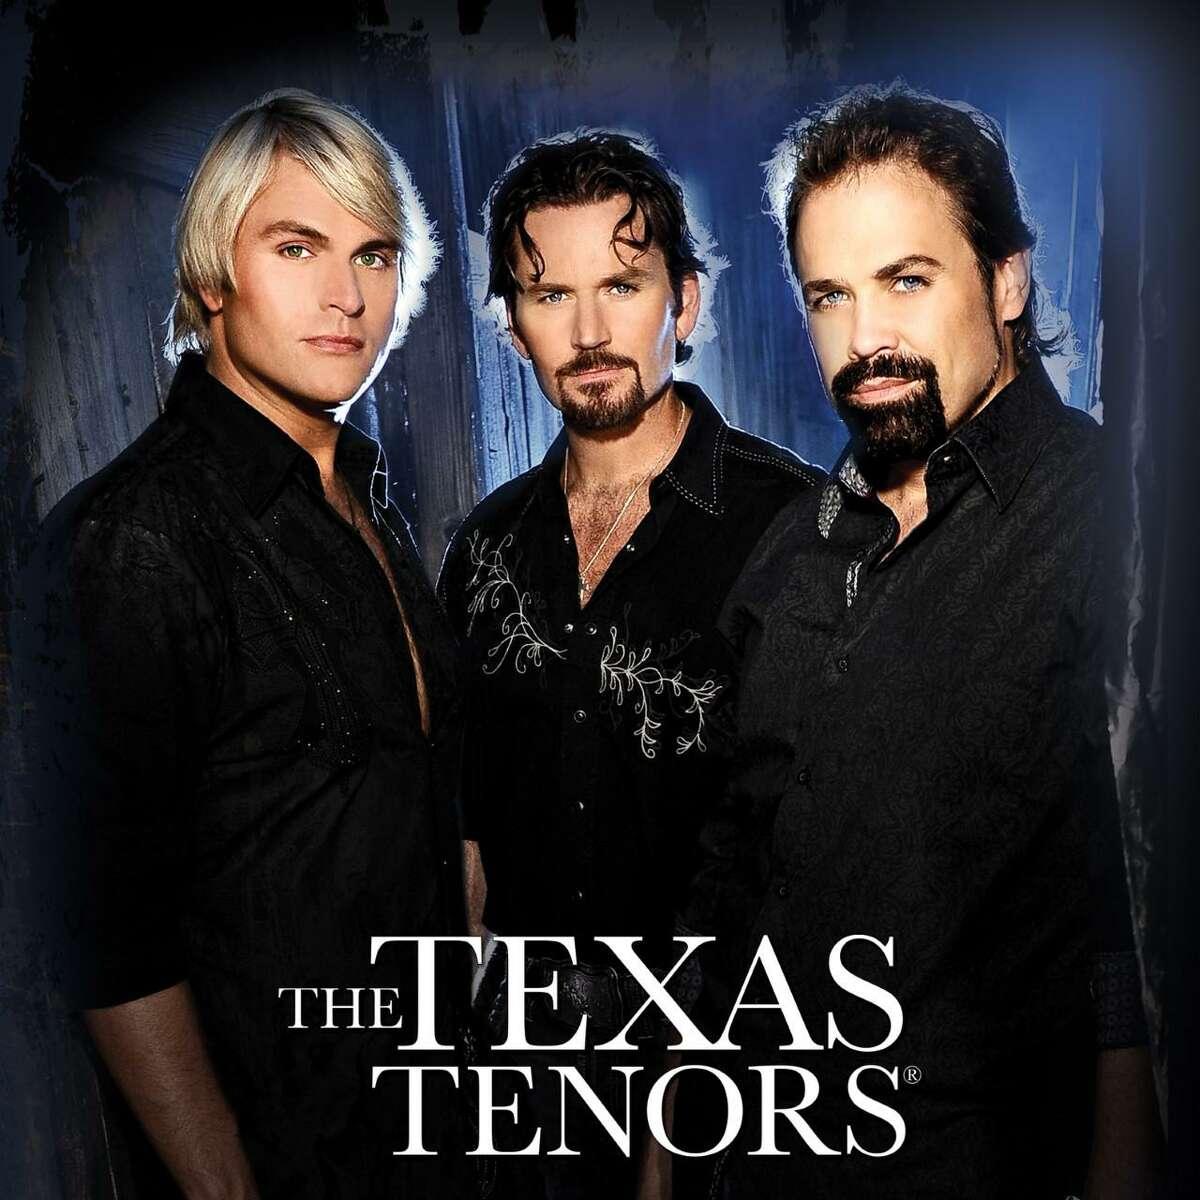 The Cypress Creek FACE Star-Lit series will feature The Texas Tenors, Belnda Davids, Kingdom Choir and Herb Alpert & Lani Hall.